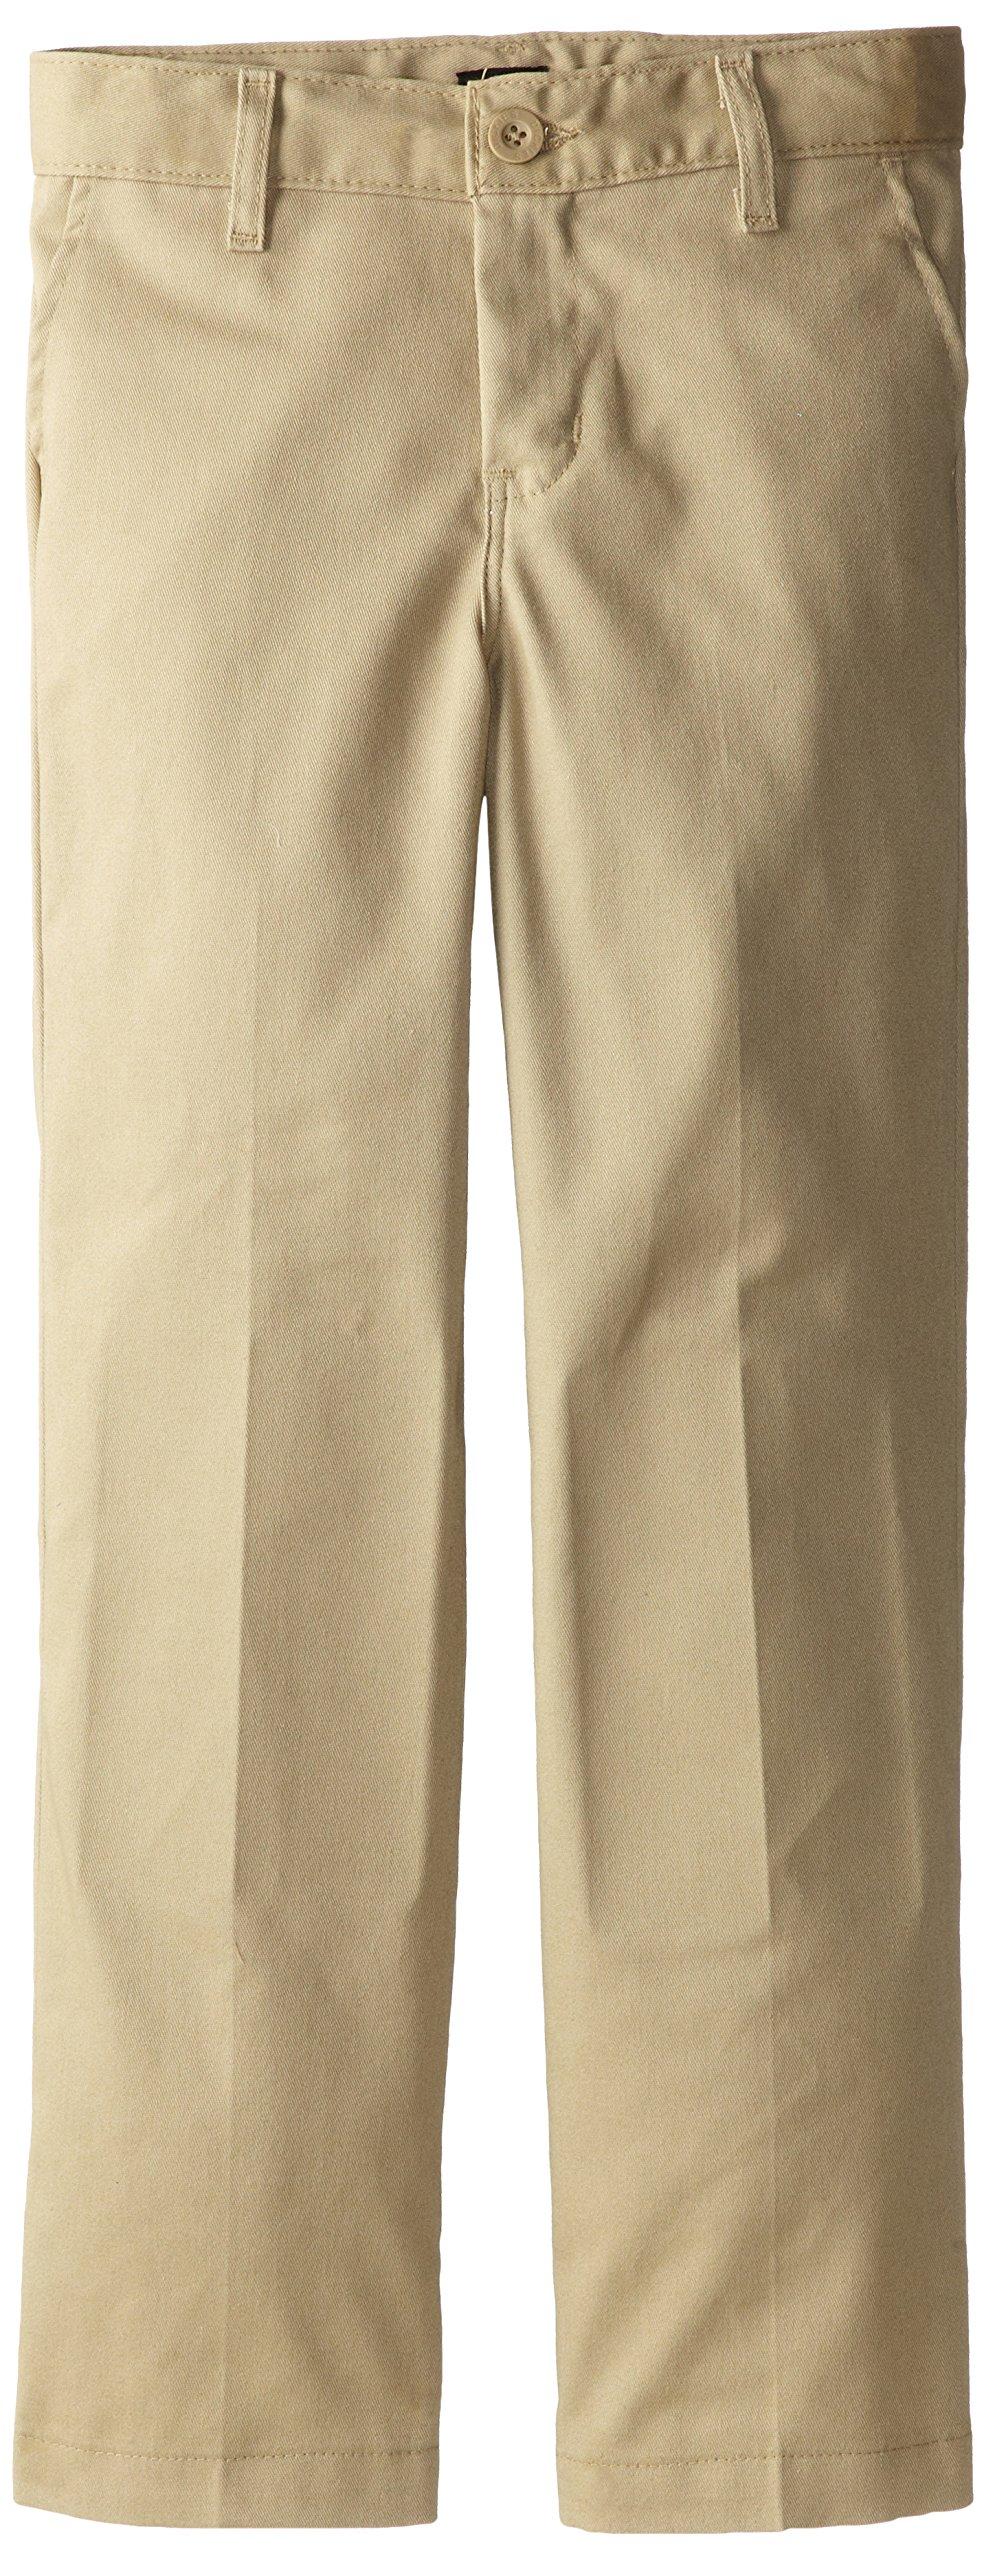 Dickies Khaki Little Boys' Flex Waist Stretch Pant, Desert Sand, 4 Regular